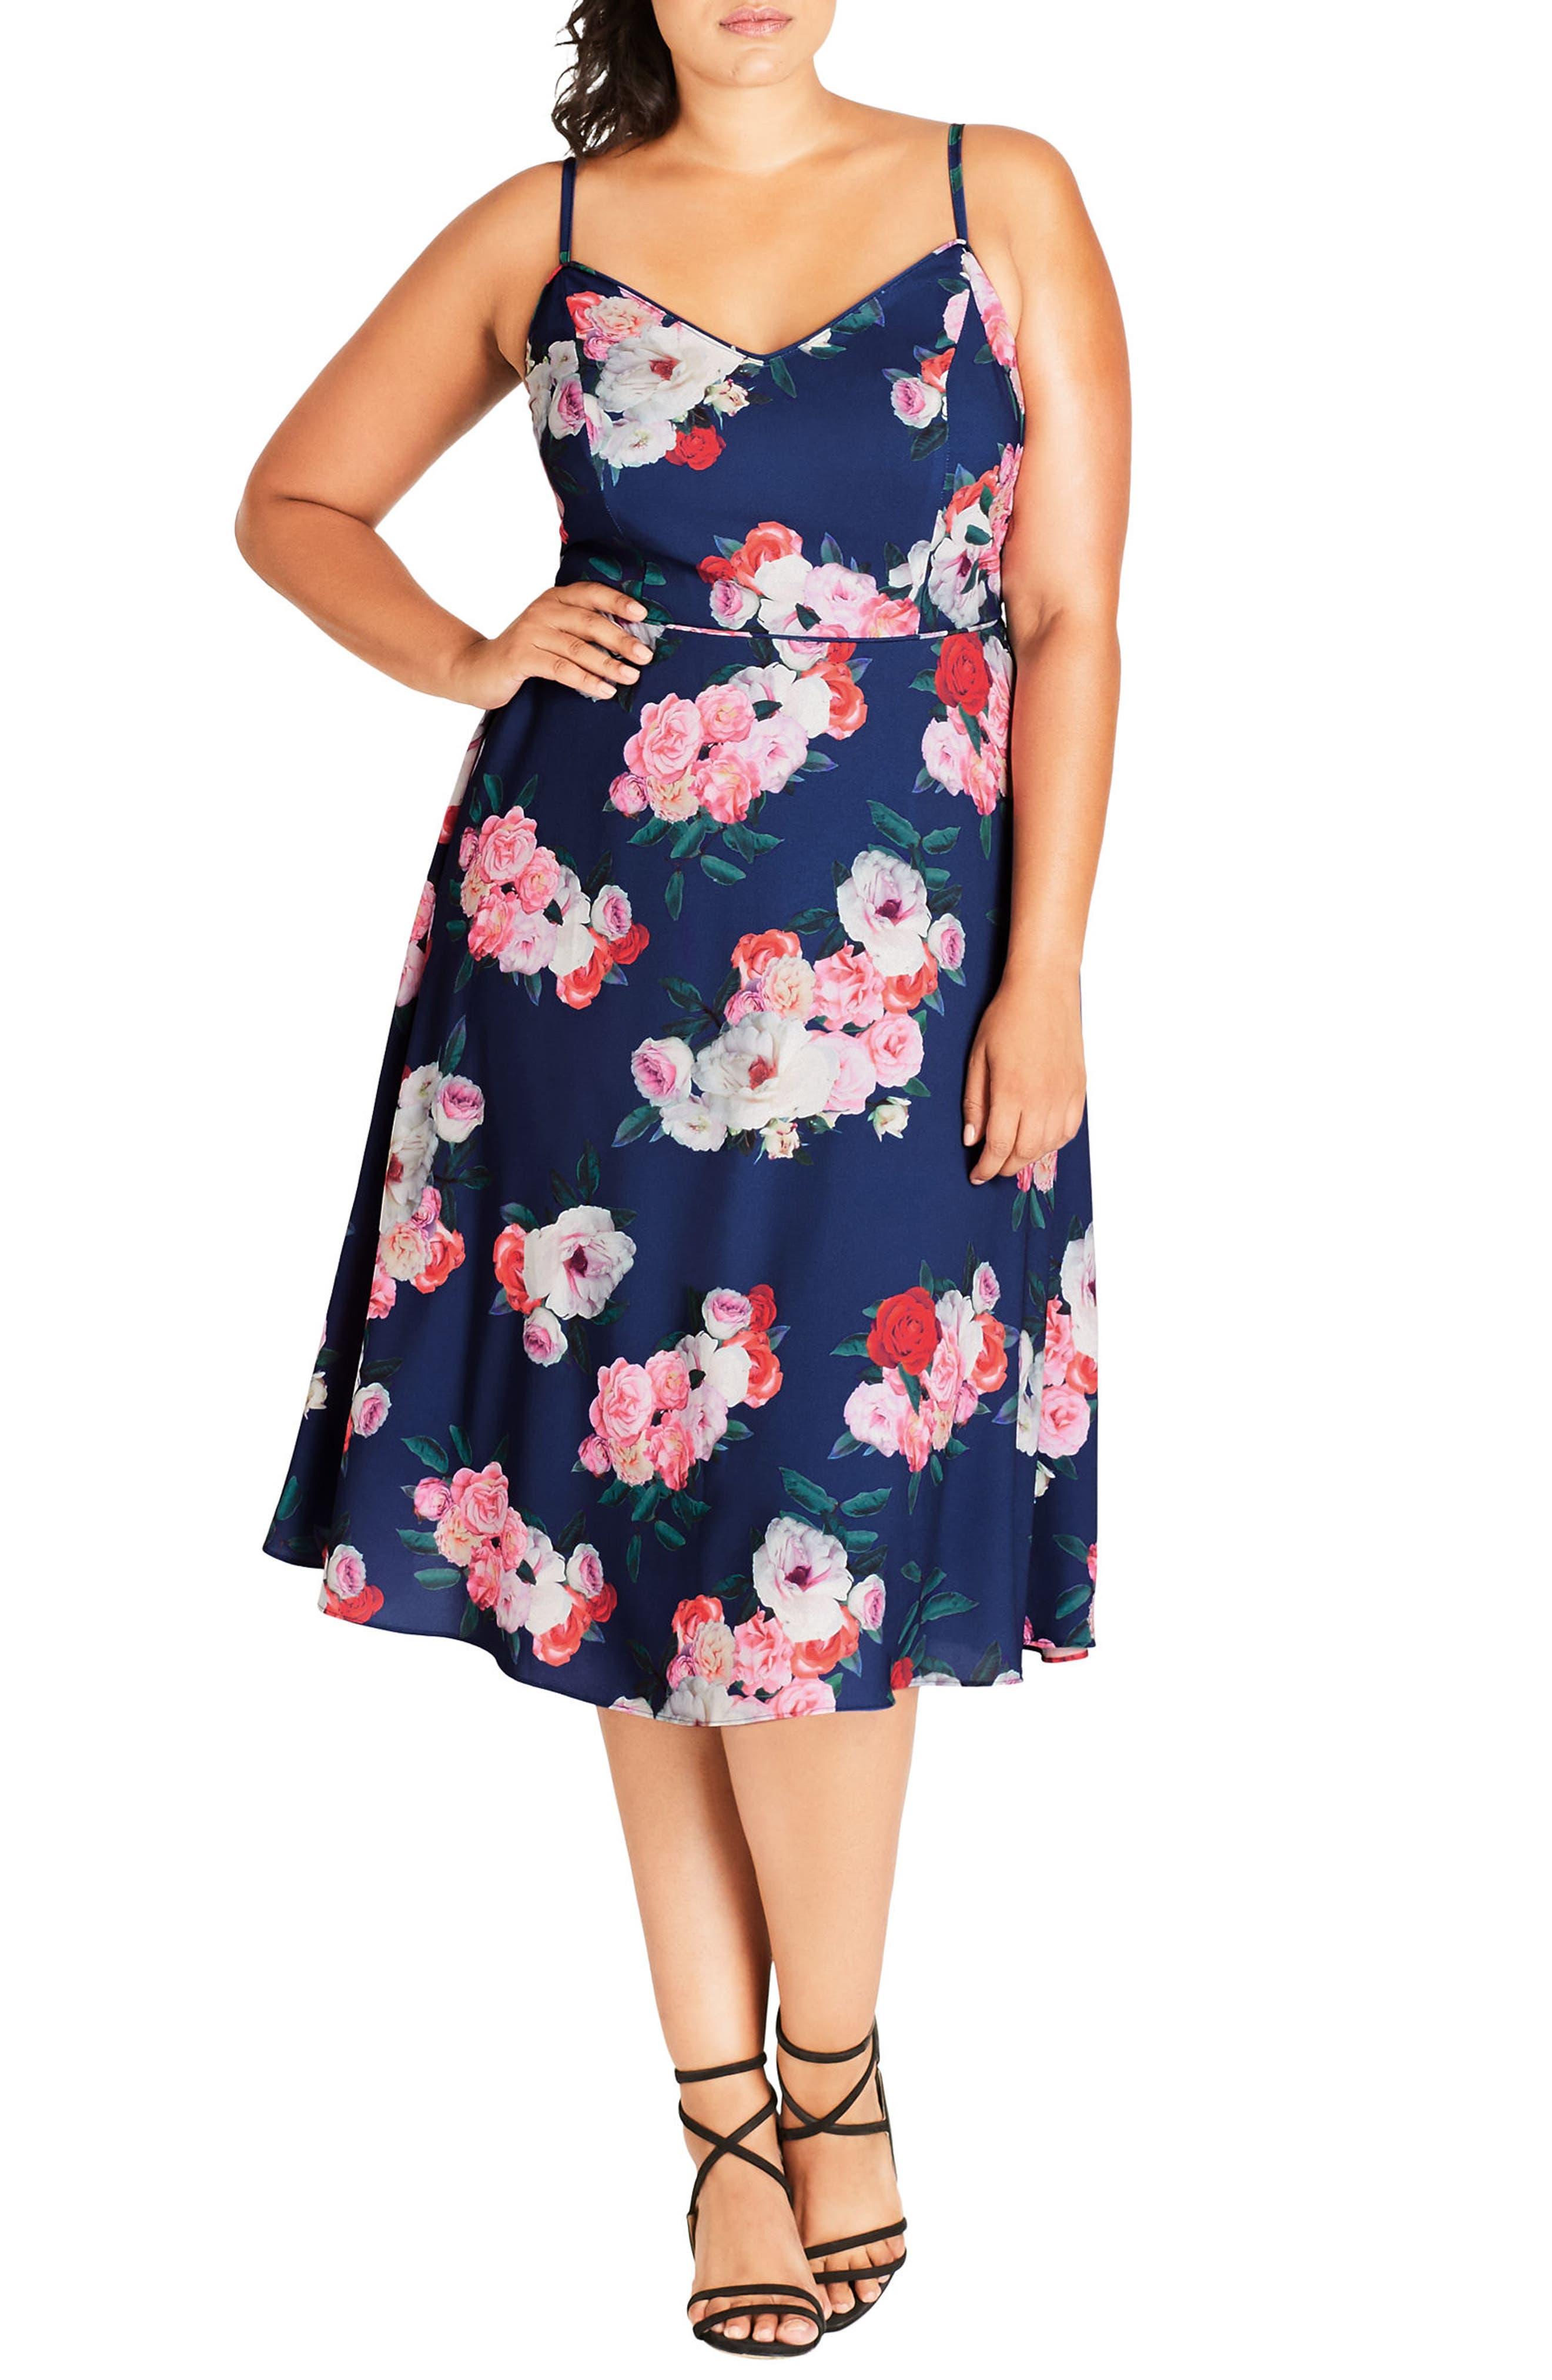 Summer Fling Floral Print Midi Dress,                         Main,                         color, 400